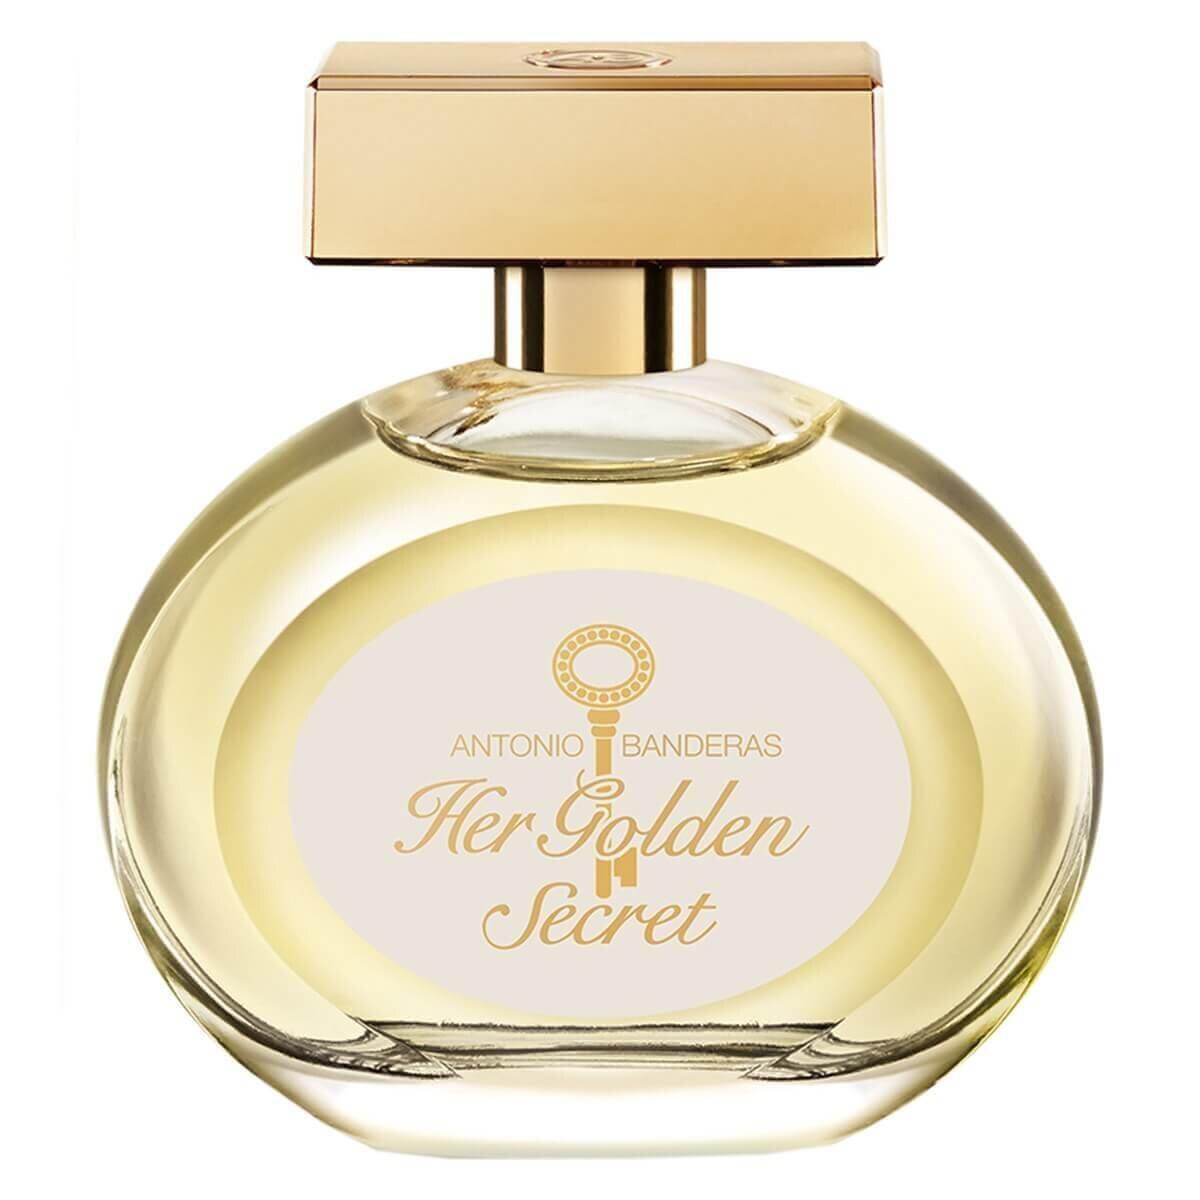 Her Golden Secret Kadın Parfüm Edt 80 ml